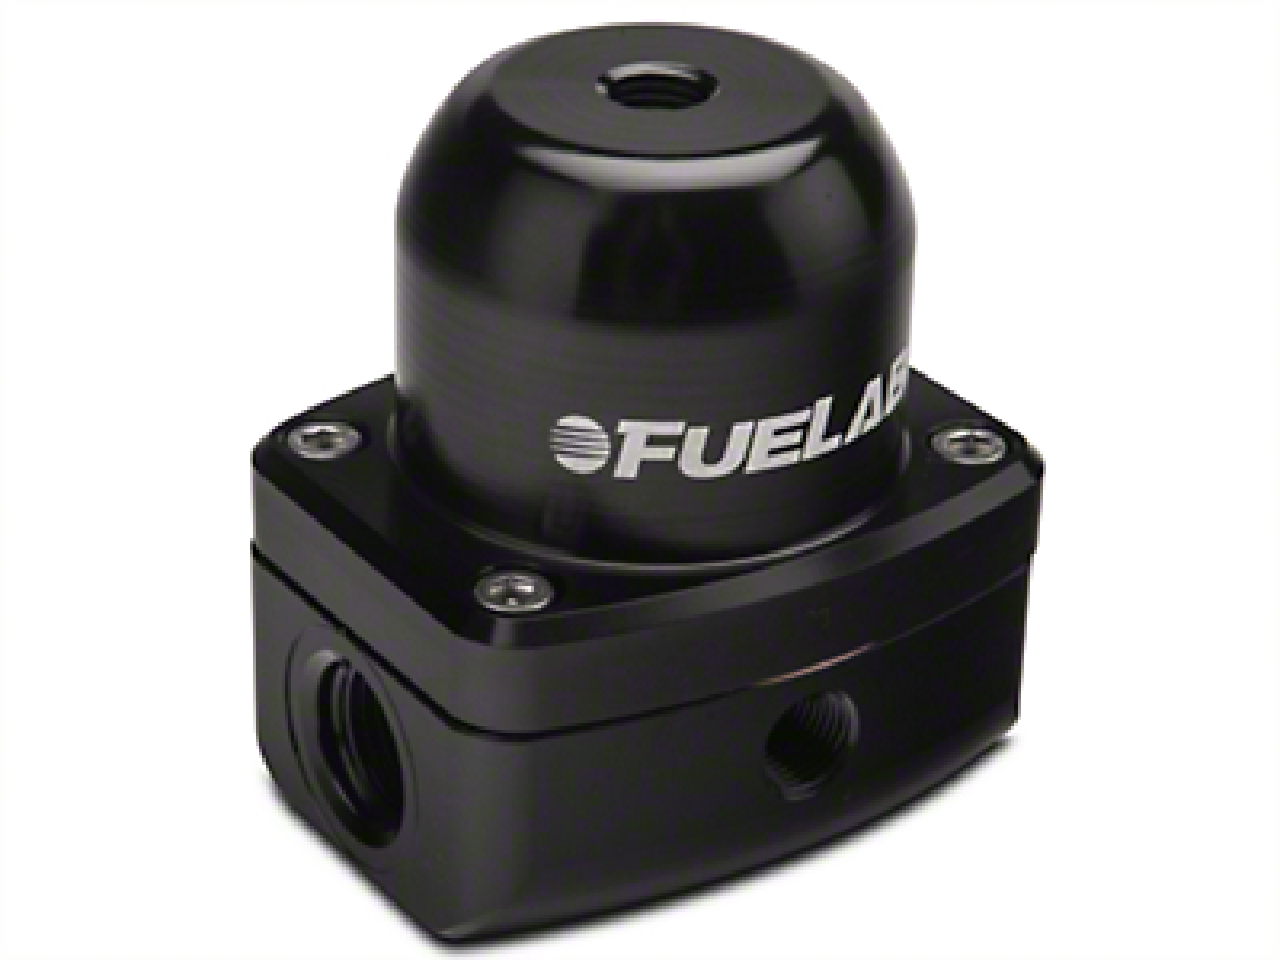 Fuelab 525 Series In-Line Adjustable Fuel Pressure Regulator - 6AN (86-14 All)